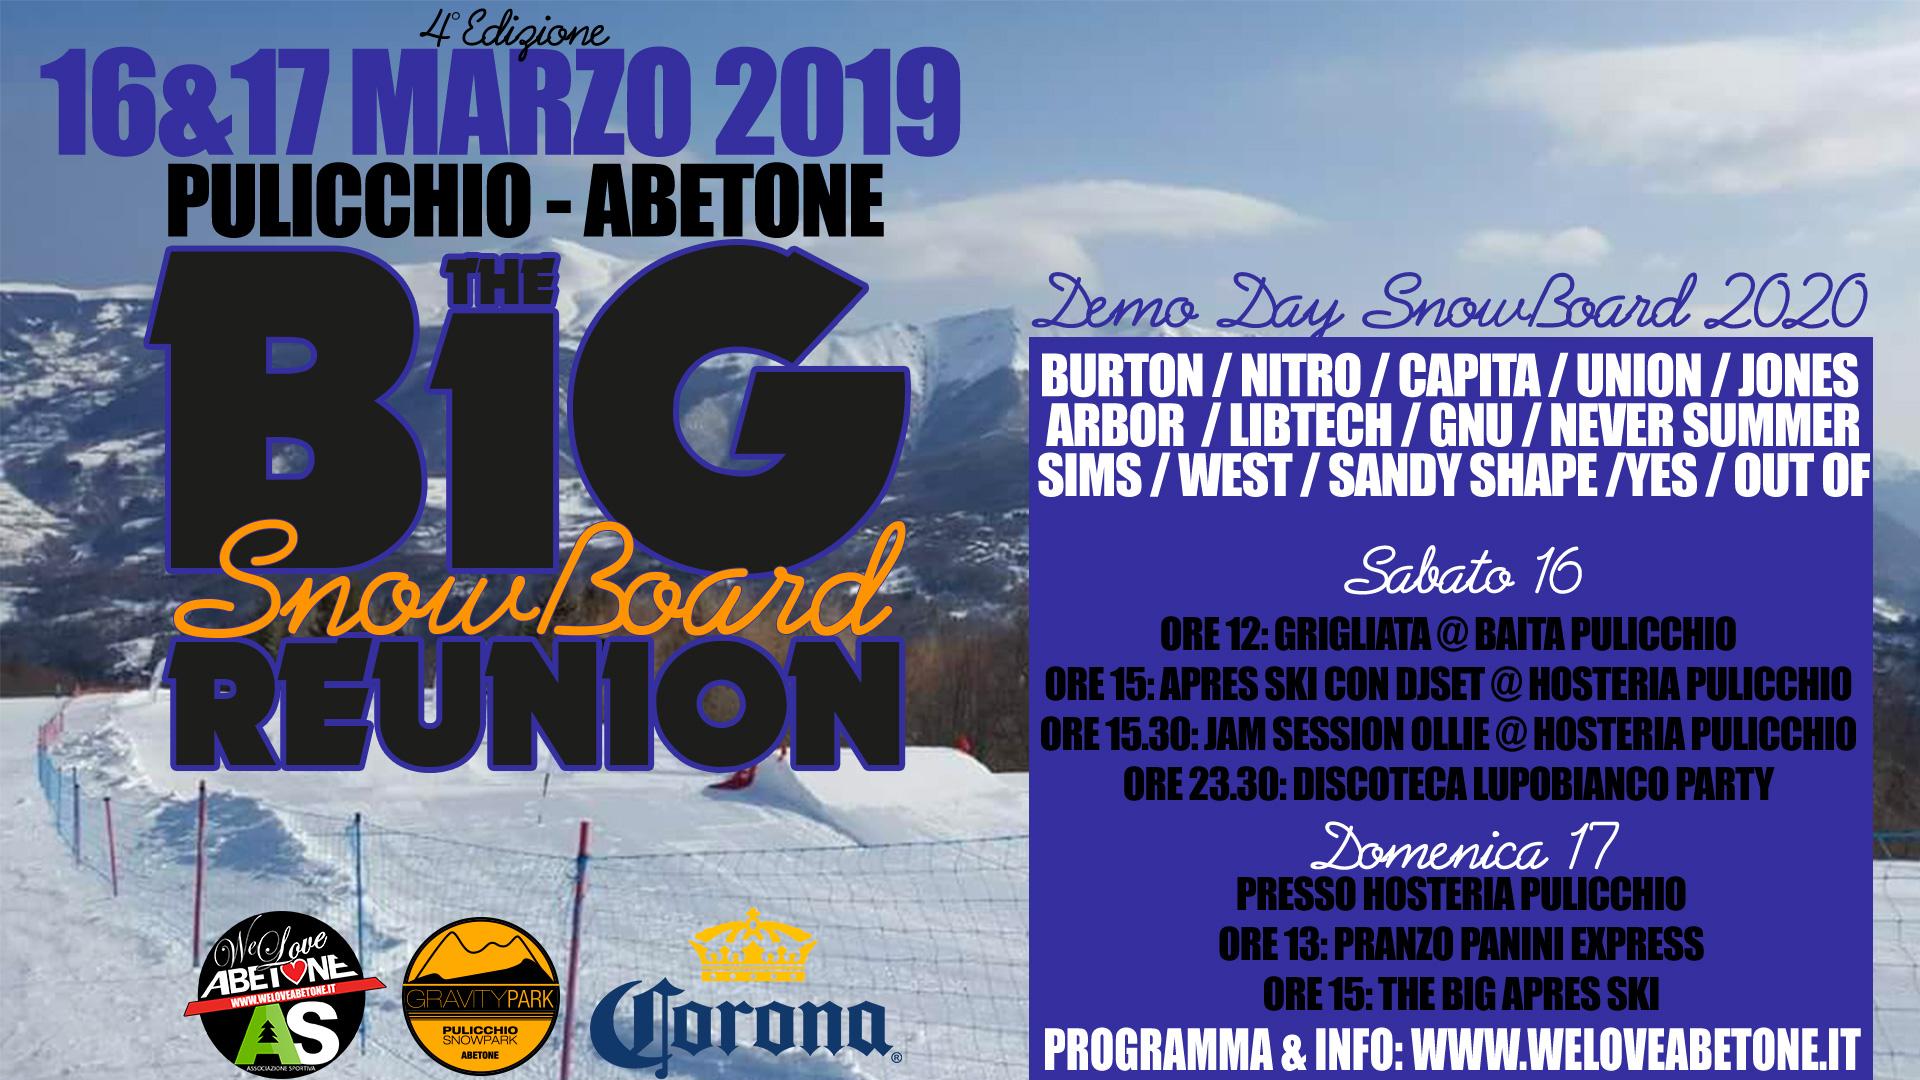 big snowboard reunion 2019 abetone Pulicchio